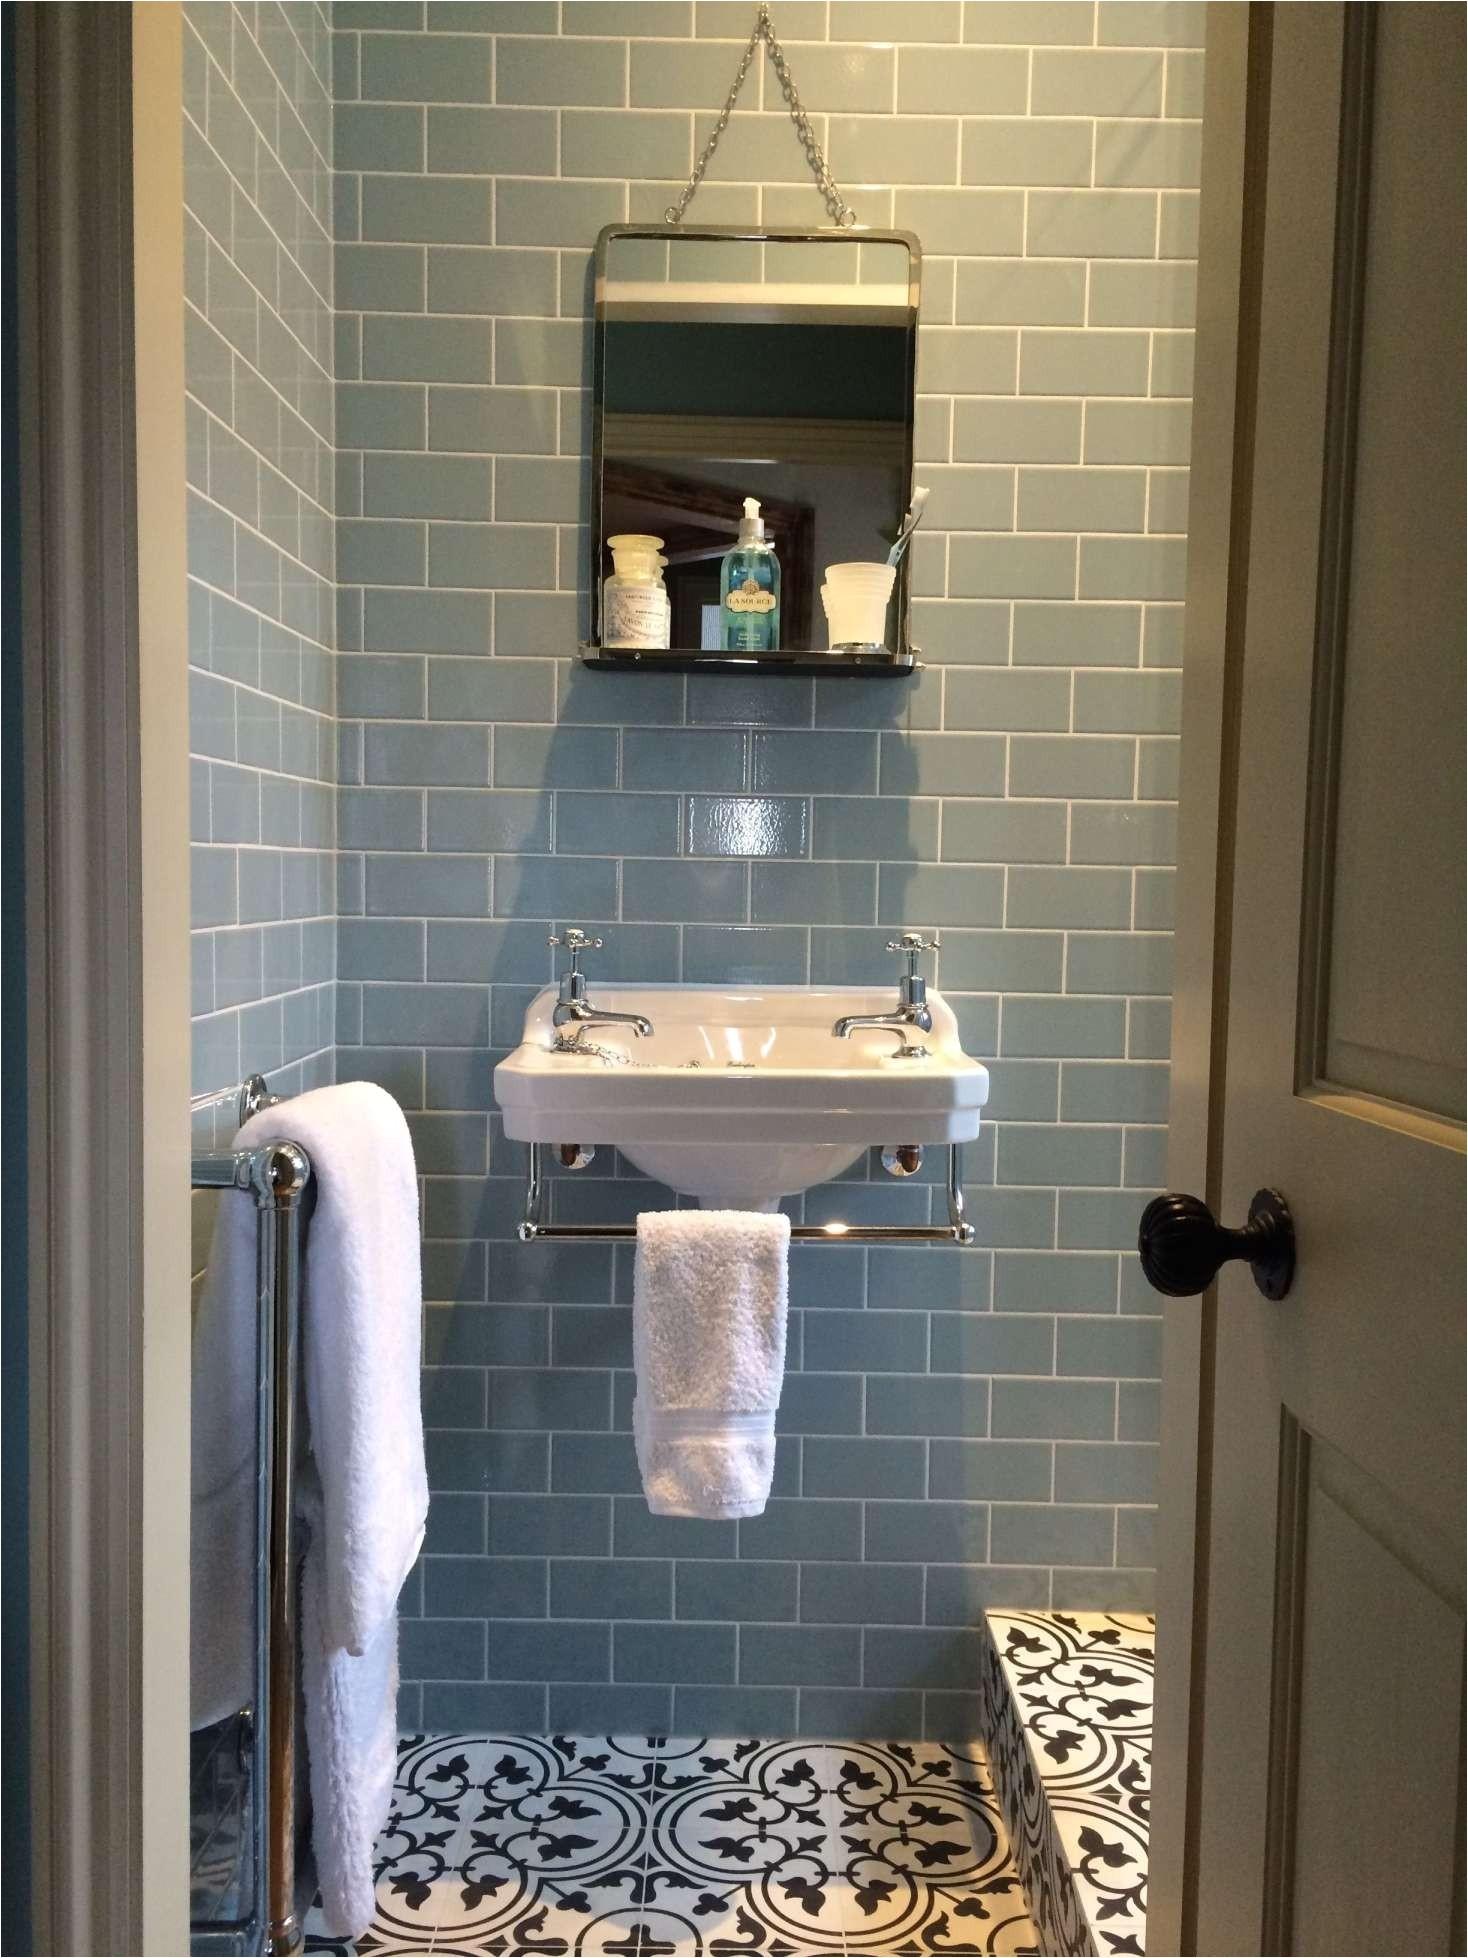 Bathroom Tiles Design Ideas Designer Bathroom Tile Best Bathroom Floor Tile Design Ideas New